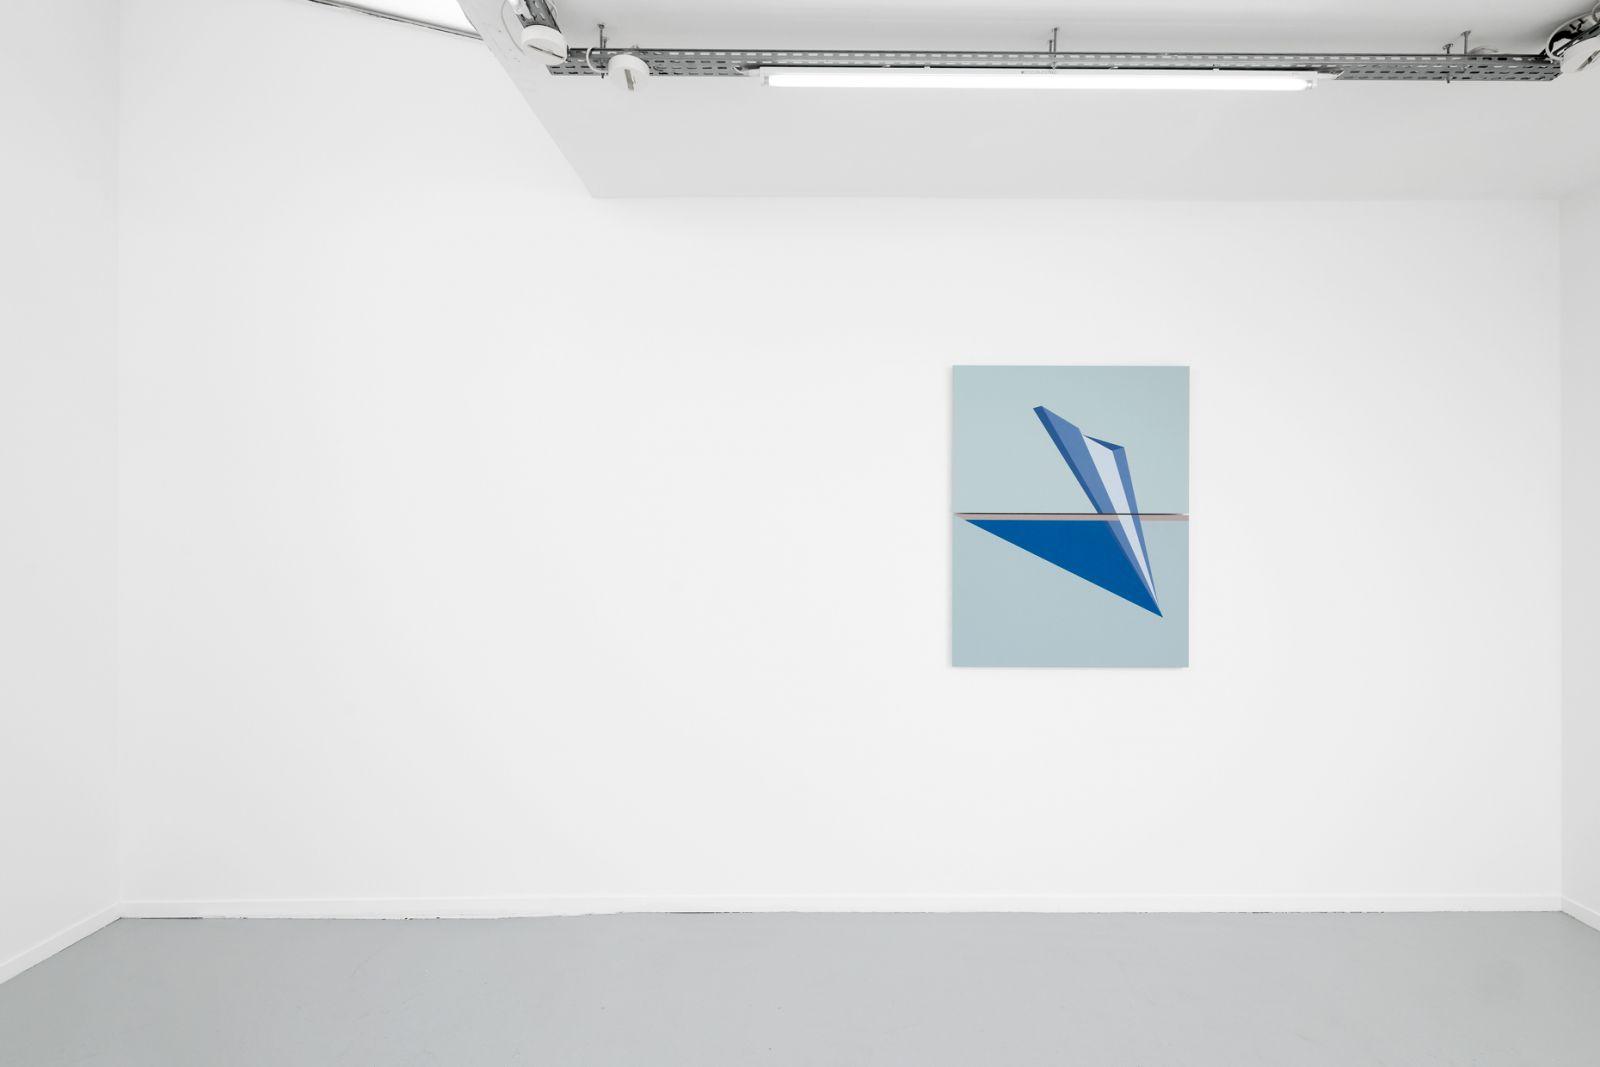 04-parties-fines-progress-gallery-vue-expo-2-aurelien-mole-web-3abb885b509c9580554f36edbcdf730d